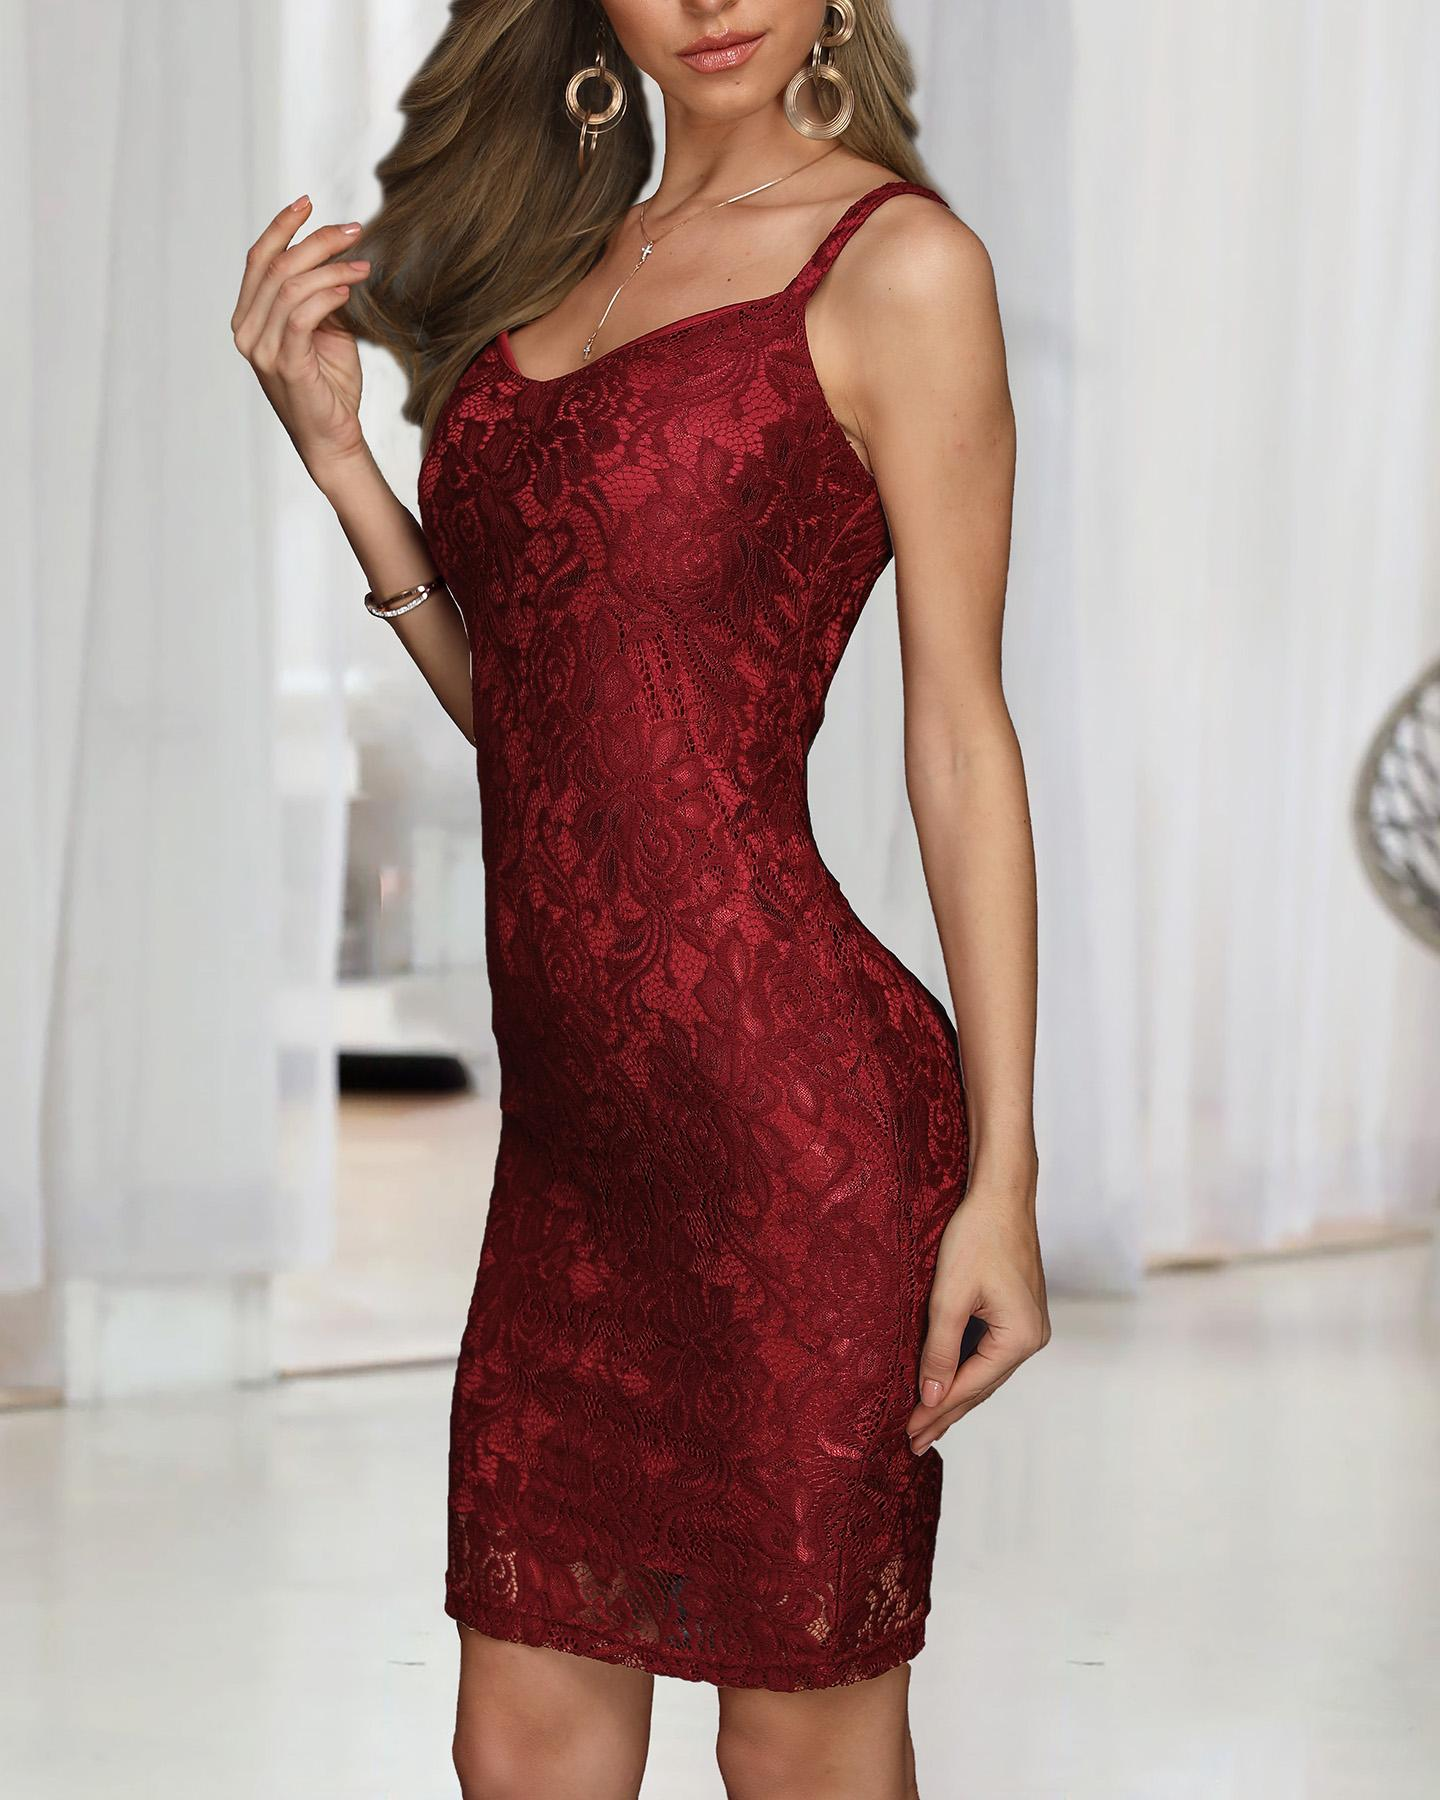 ivrose / Crochet Lace Bodycon Slip Dress